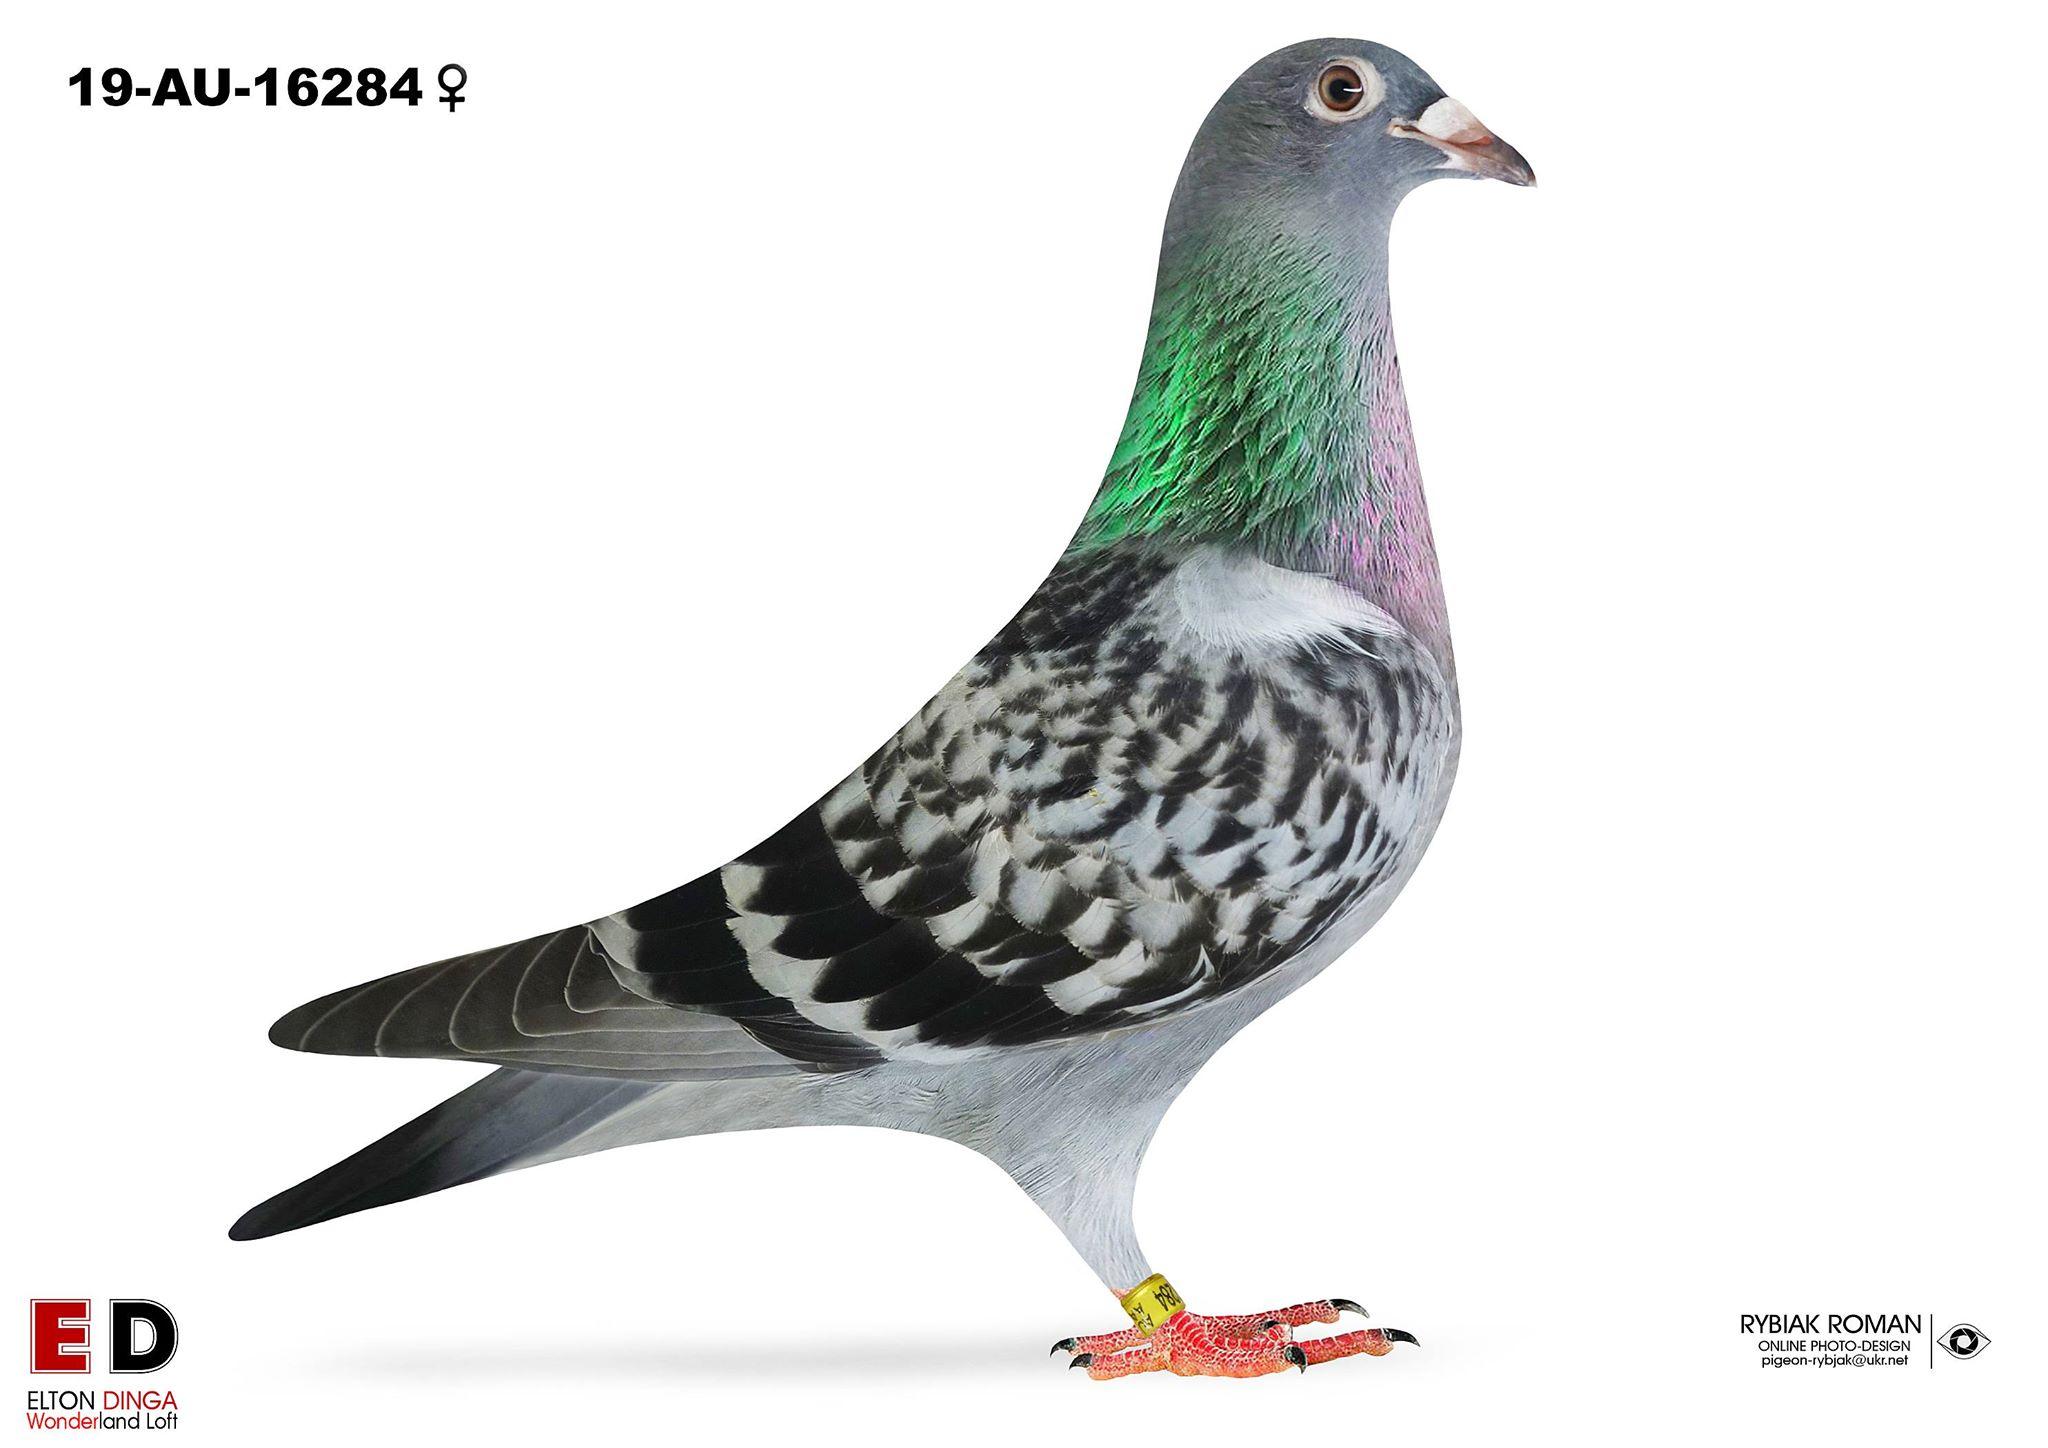 16284 - Son Champion x 2nd Ace Pigeon Blue Bucket